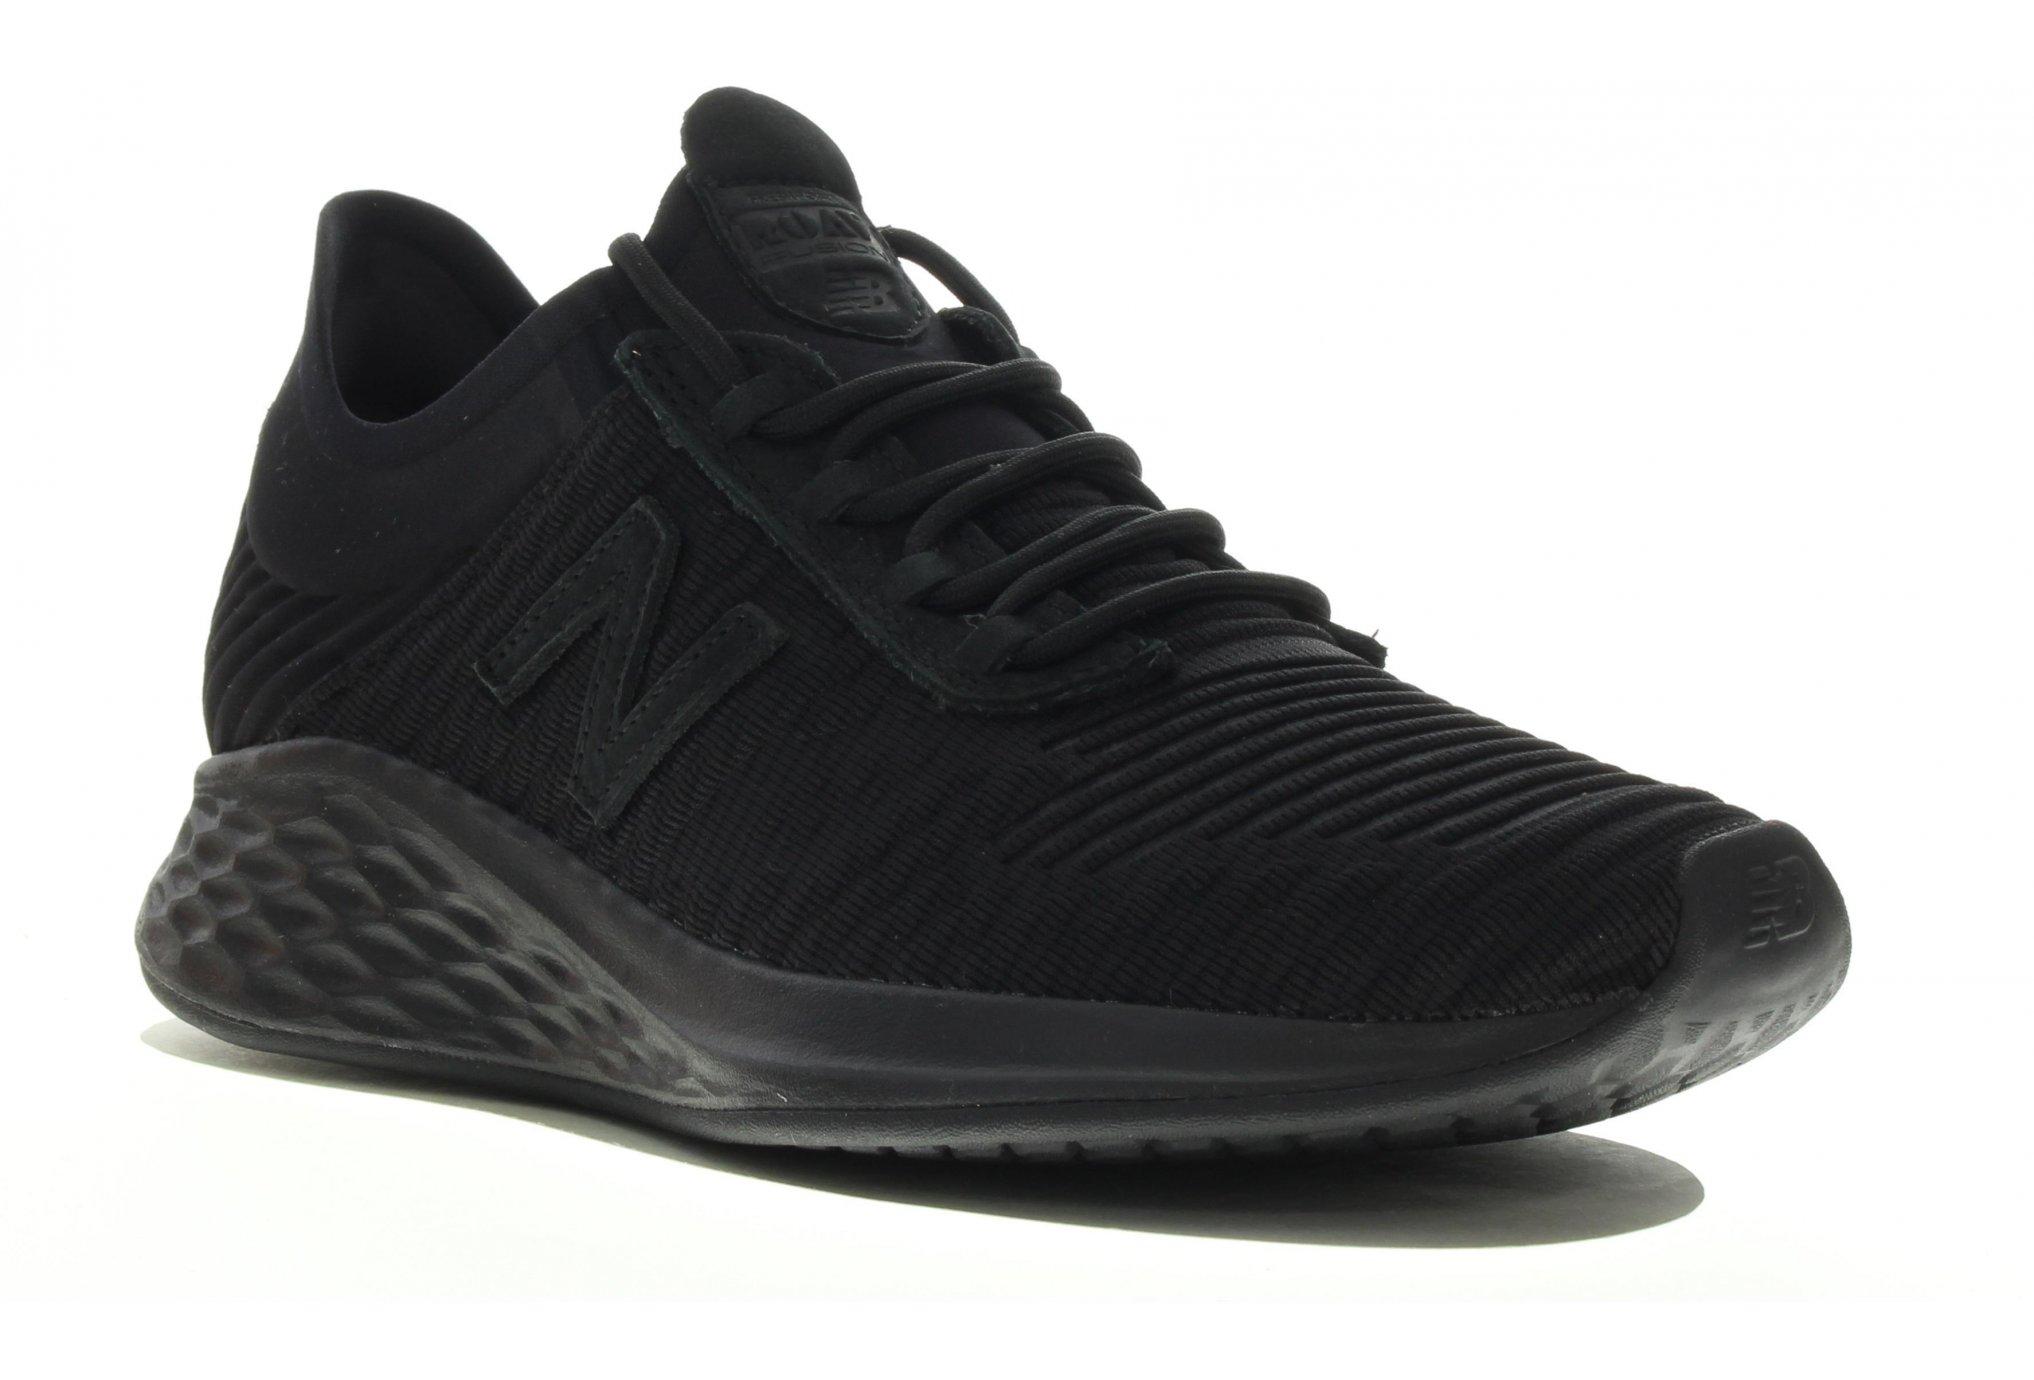 New Balance Fresh Foam Roav Fusion M Chaussures homme